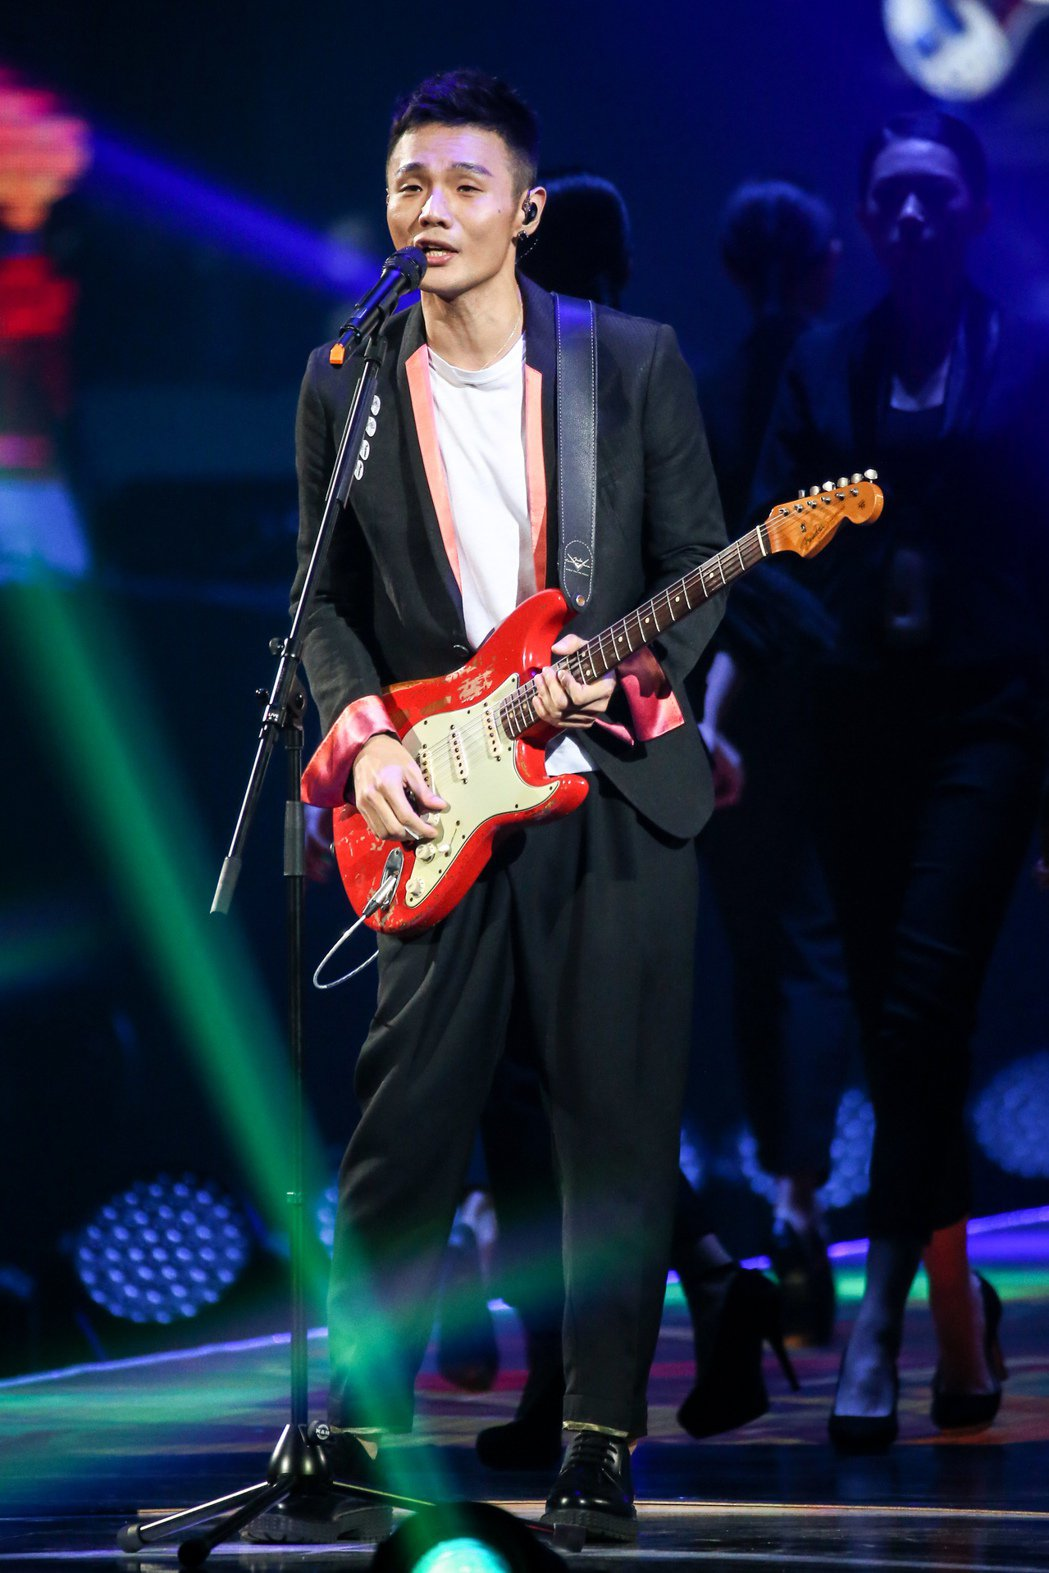 2017hito流行音樂獎頒獎典禮在台北小巨蛋舉行,內地推崇歌手得主李榮浩表演。